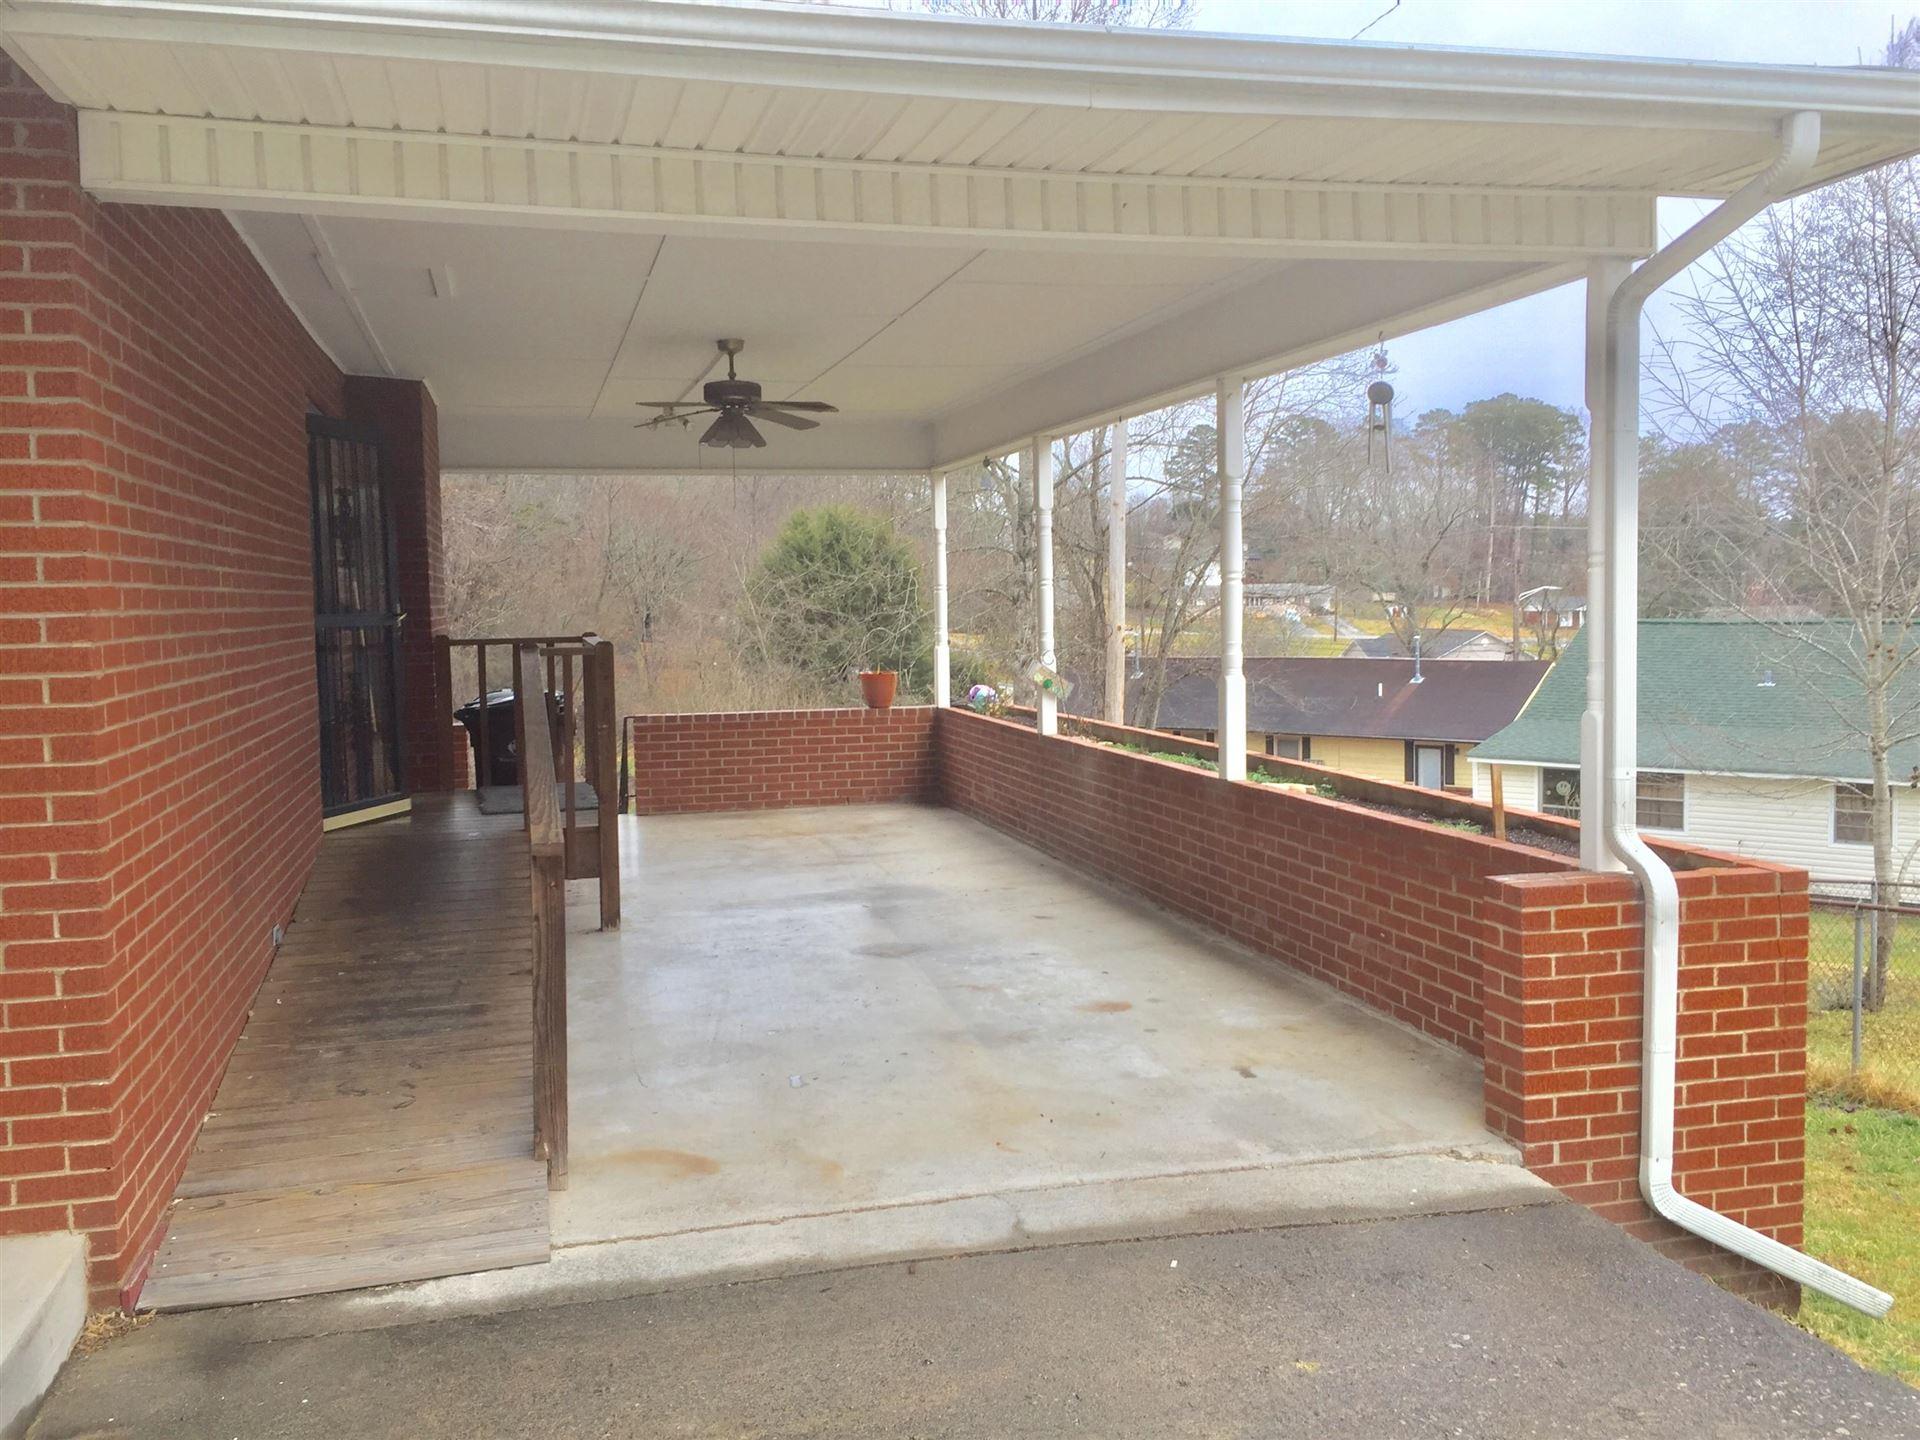 Photo of 102 N Hickory Lane, Oak Ridge, TN 37830 (MLS # 1139707)